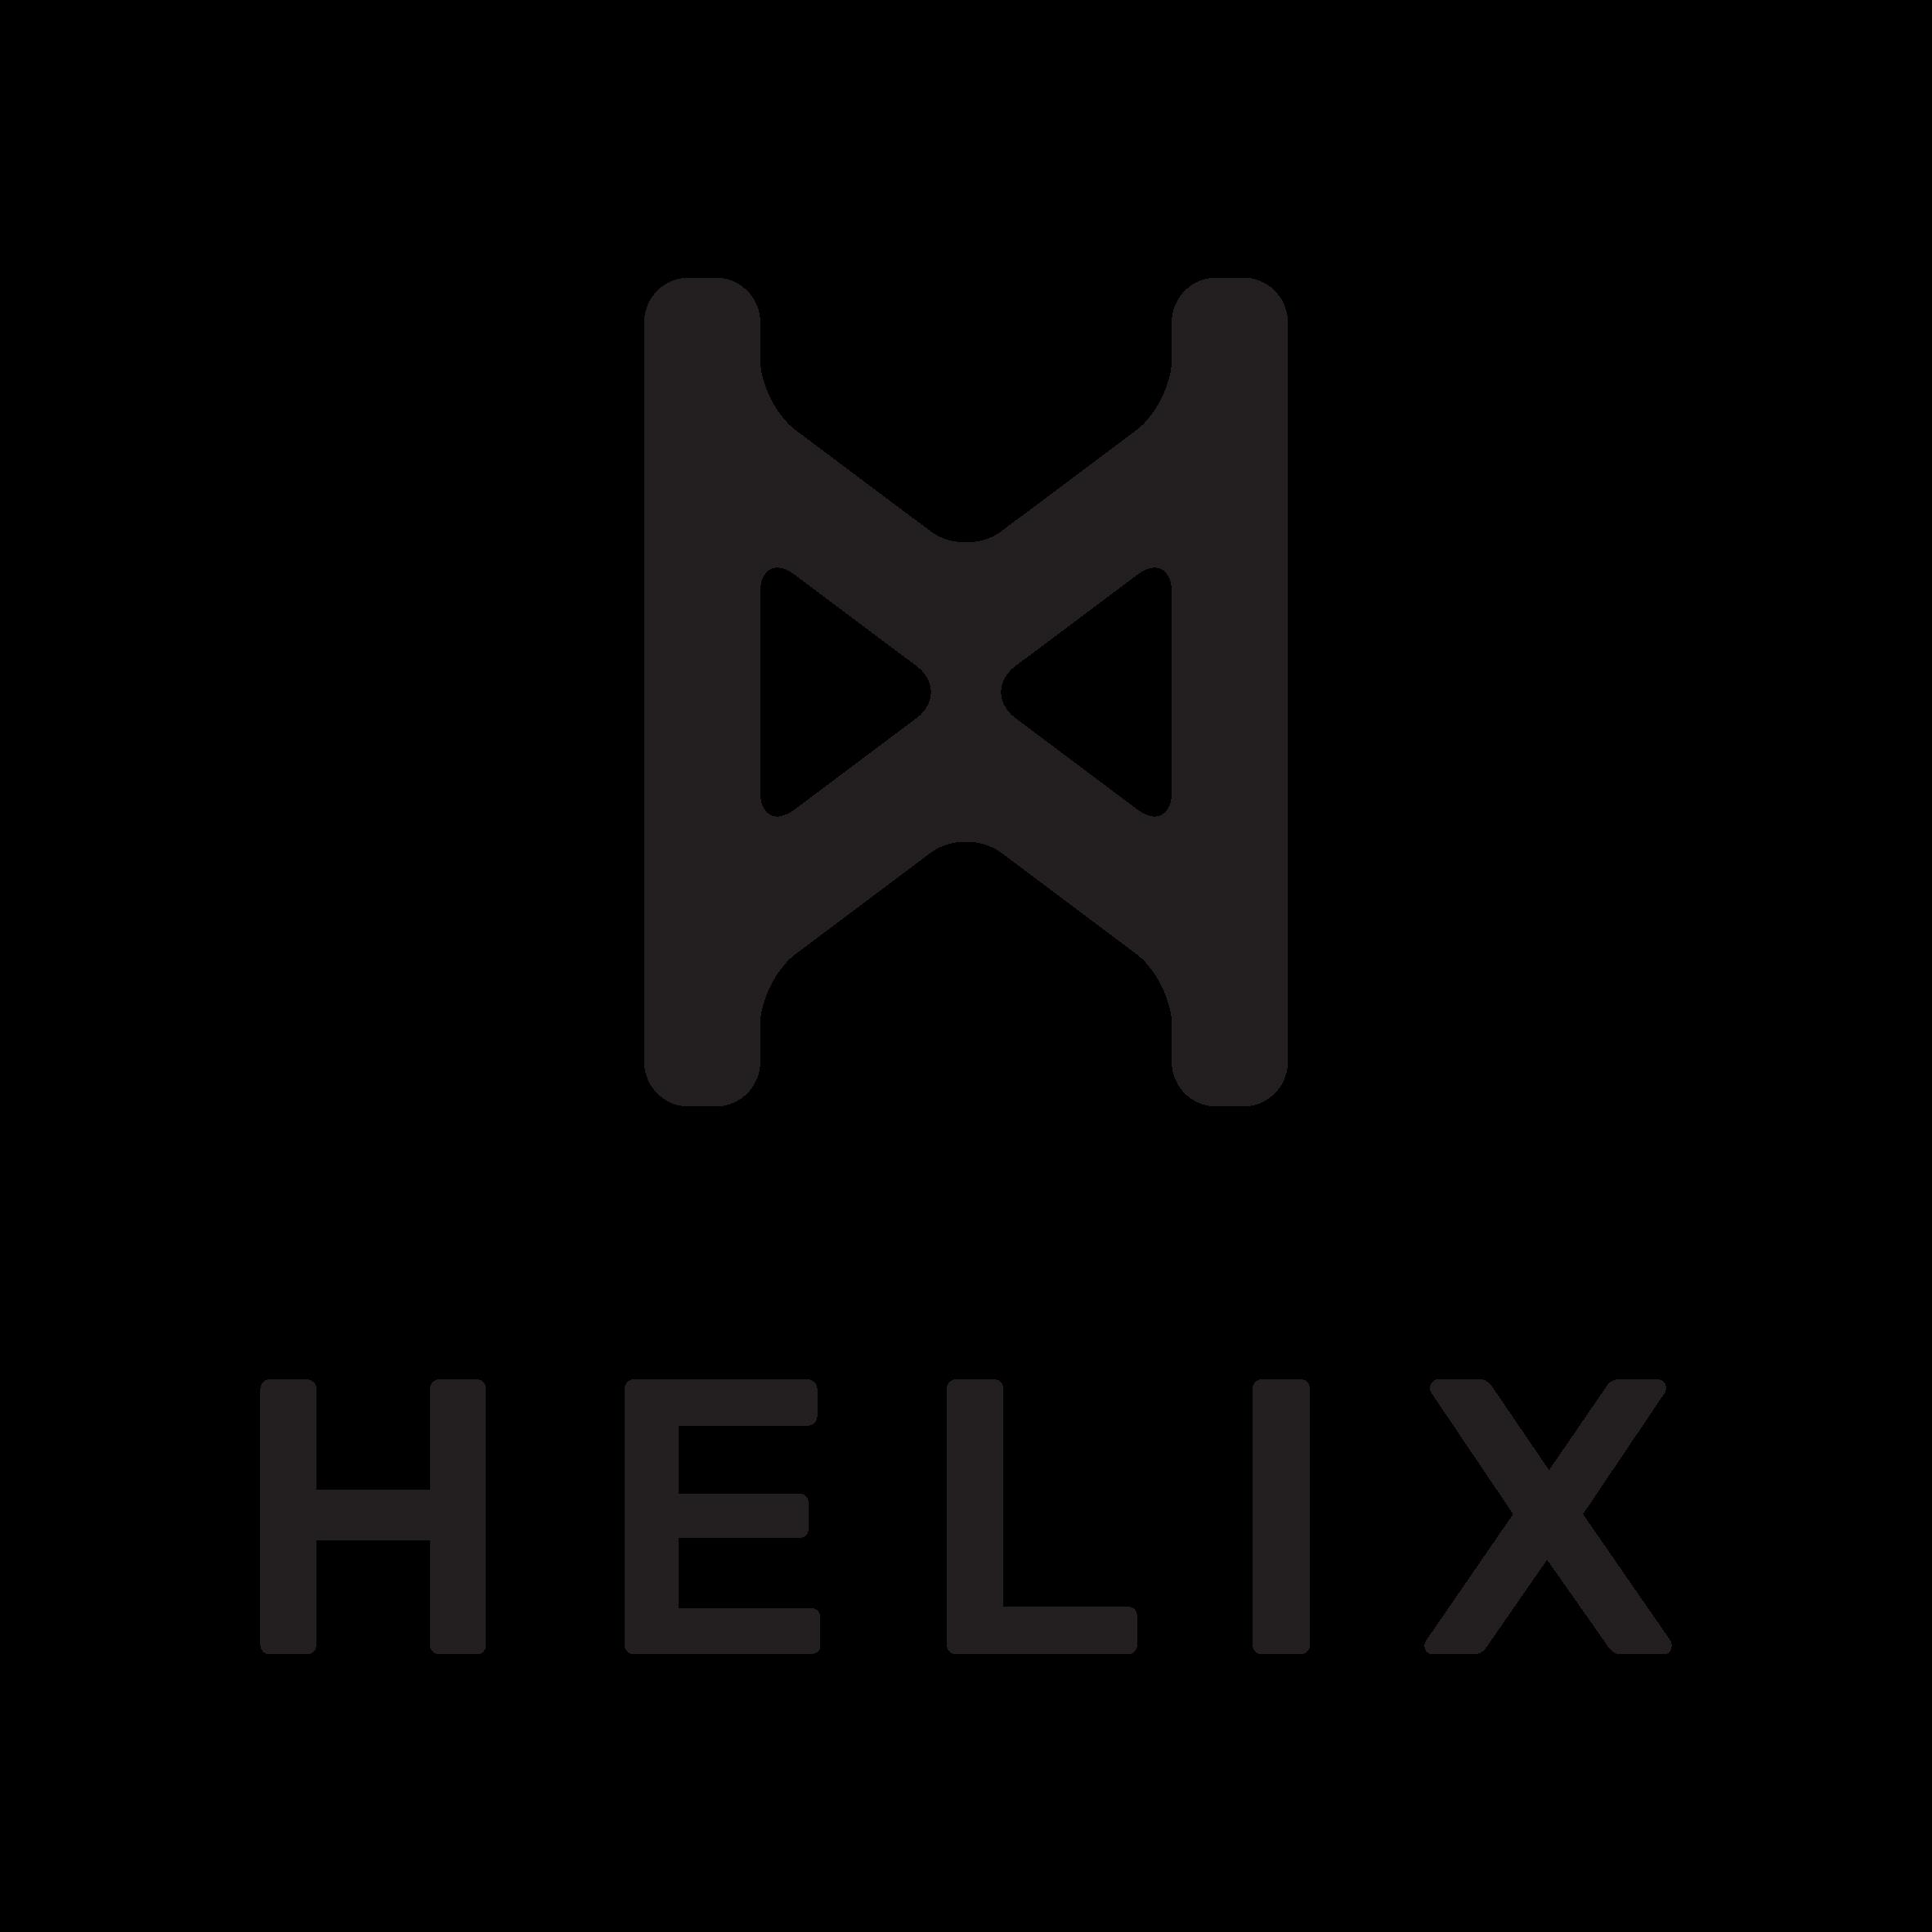 helix-logo-vertical-b.png